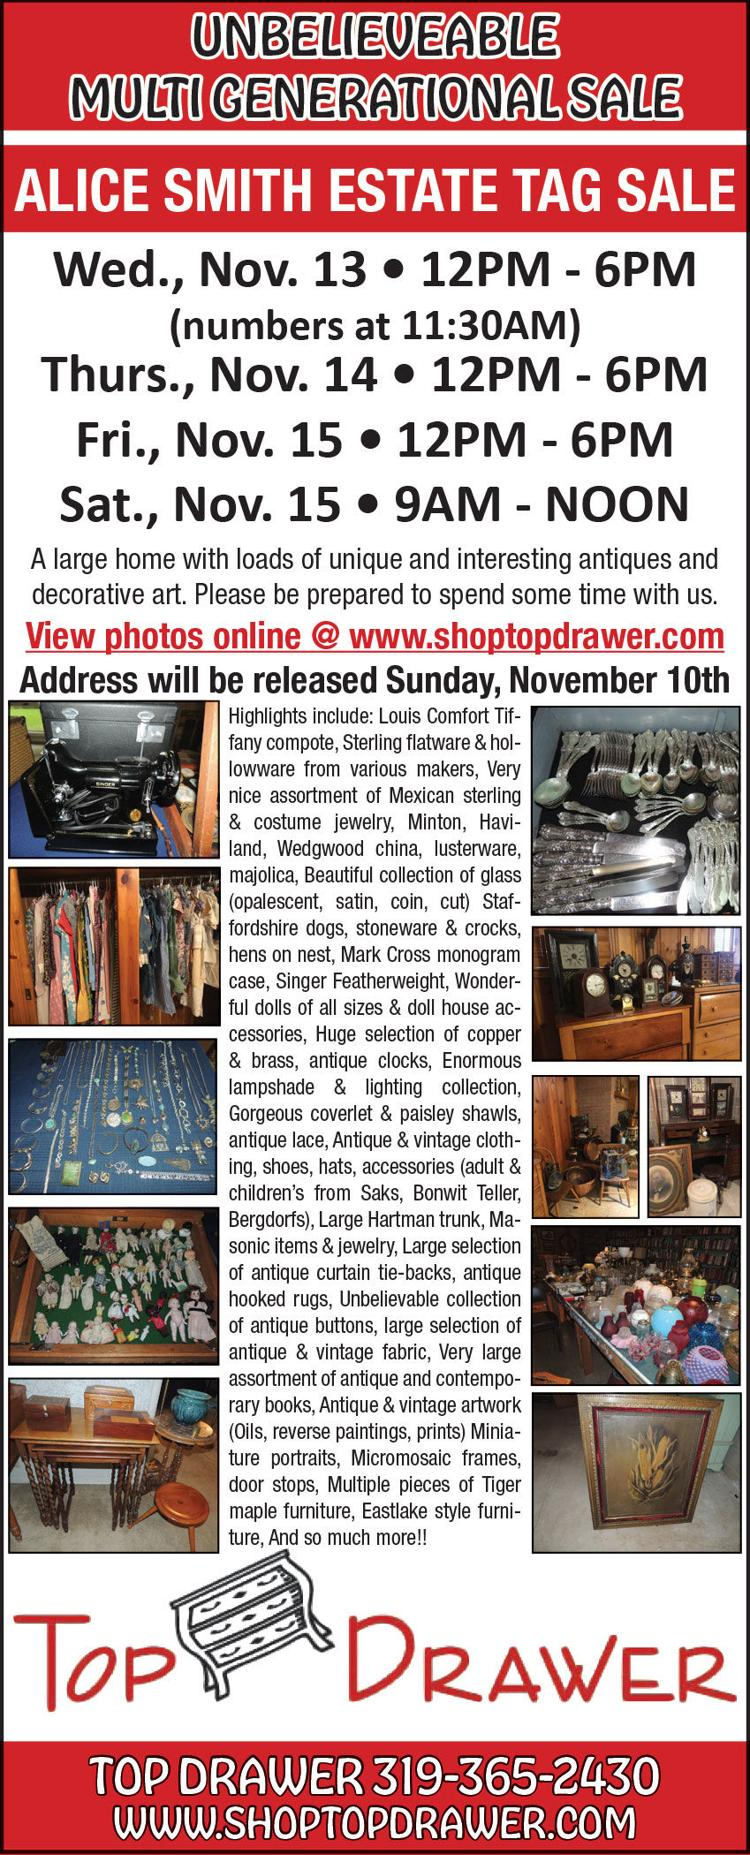 Sterling flatware, costume jewelry, stoneware, crocks, artwork